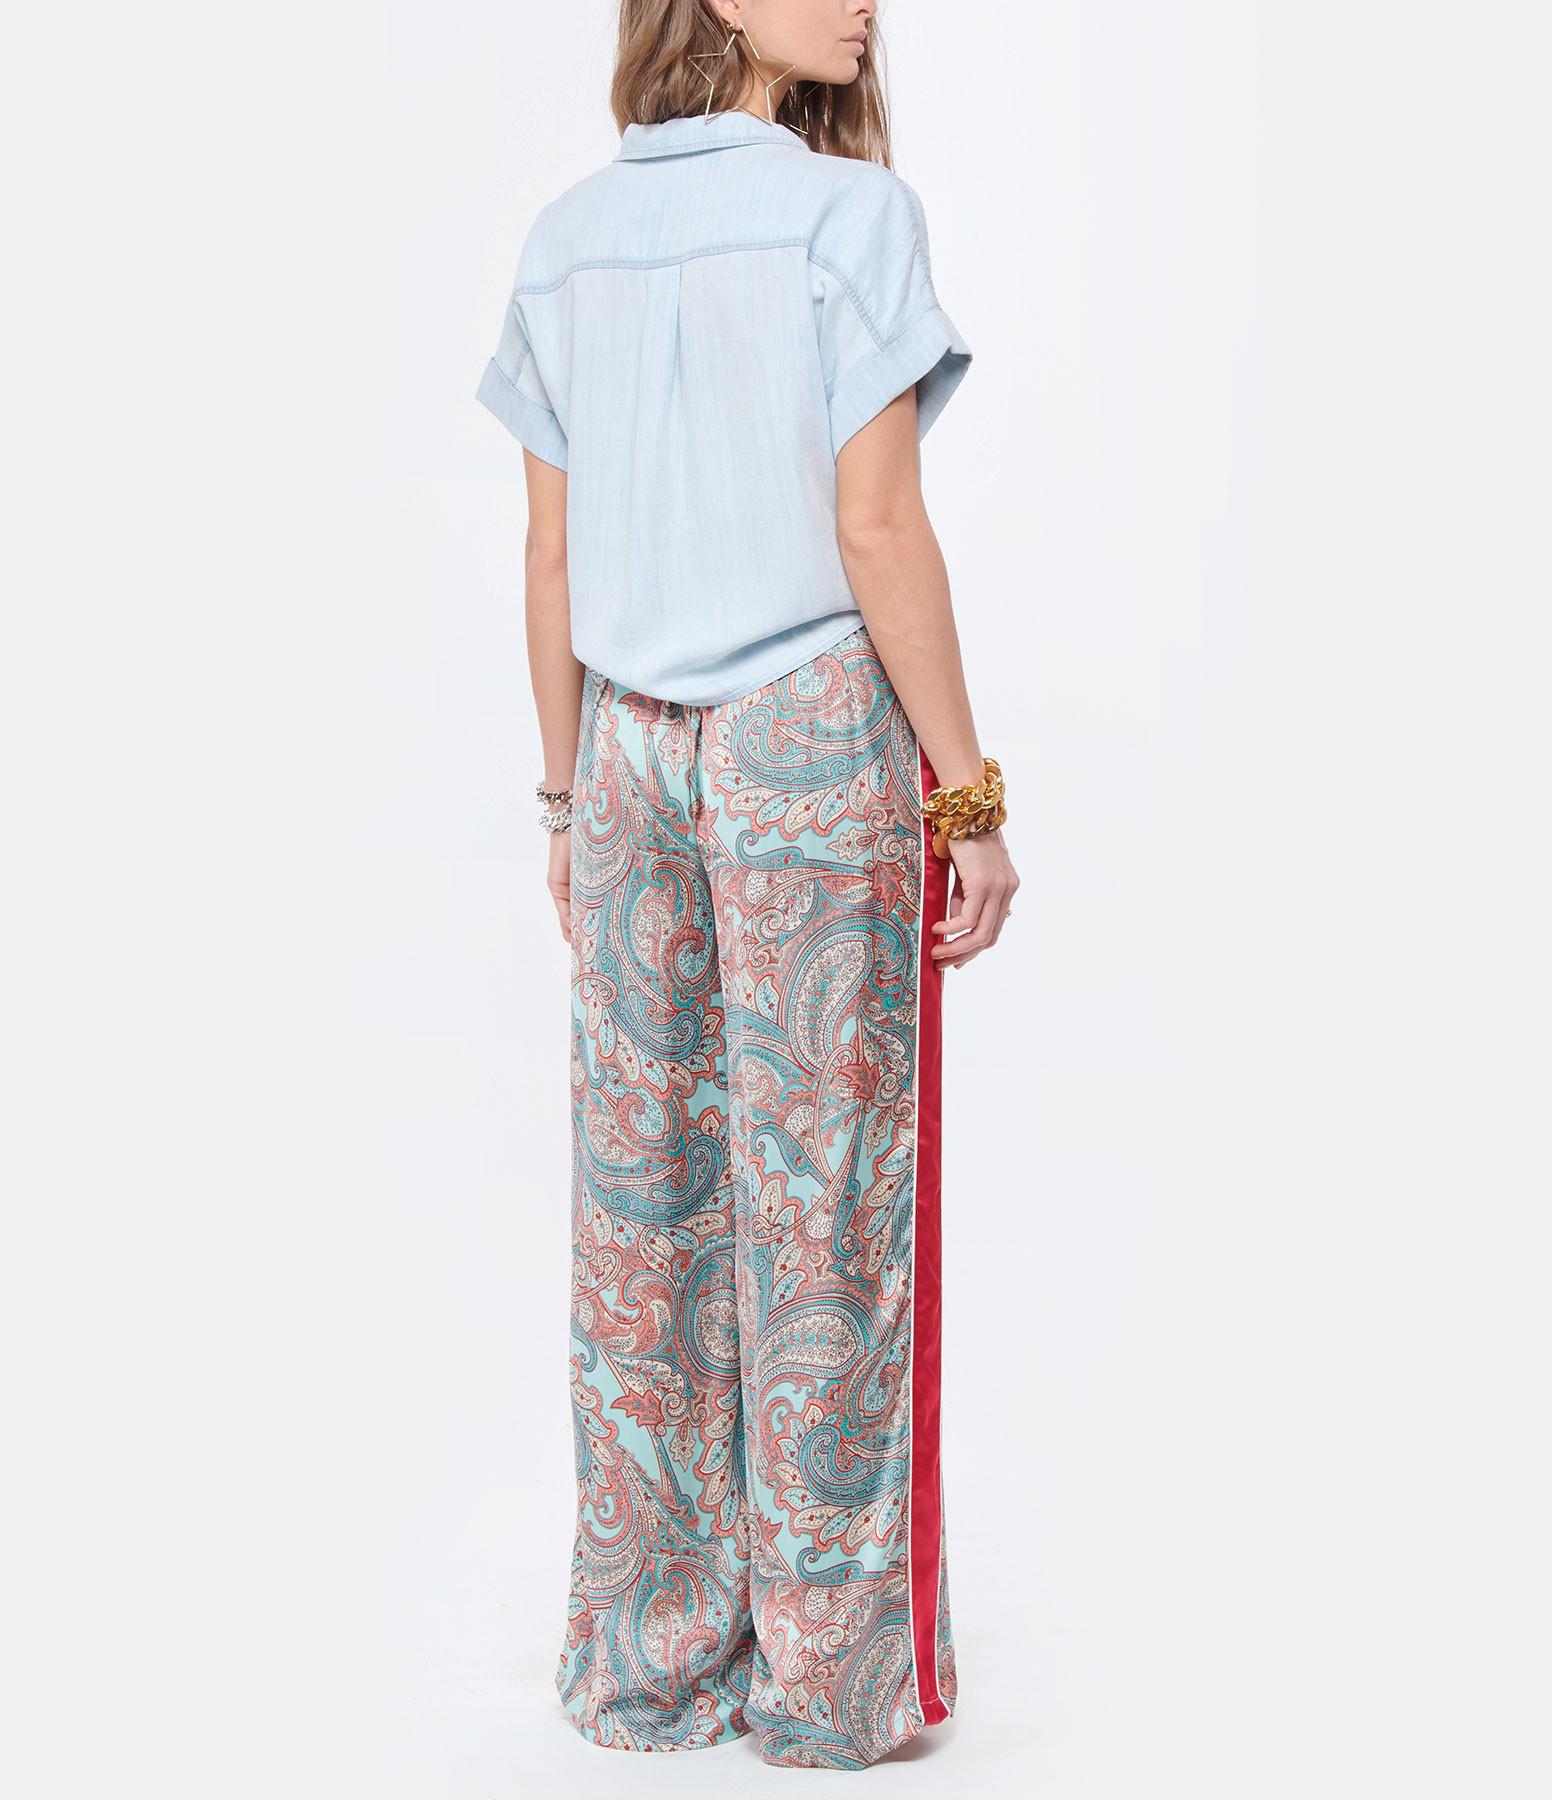 BELLA DAHL - Chemise Capsleeve Tie Front Shirt Desert Sky